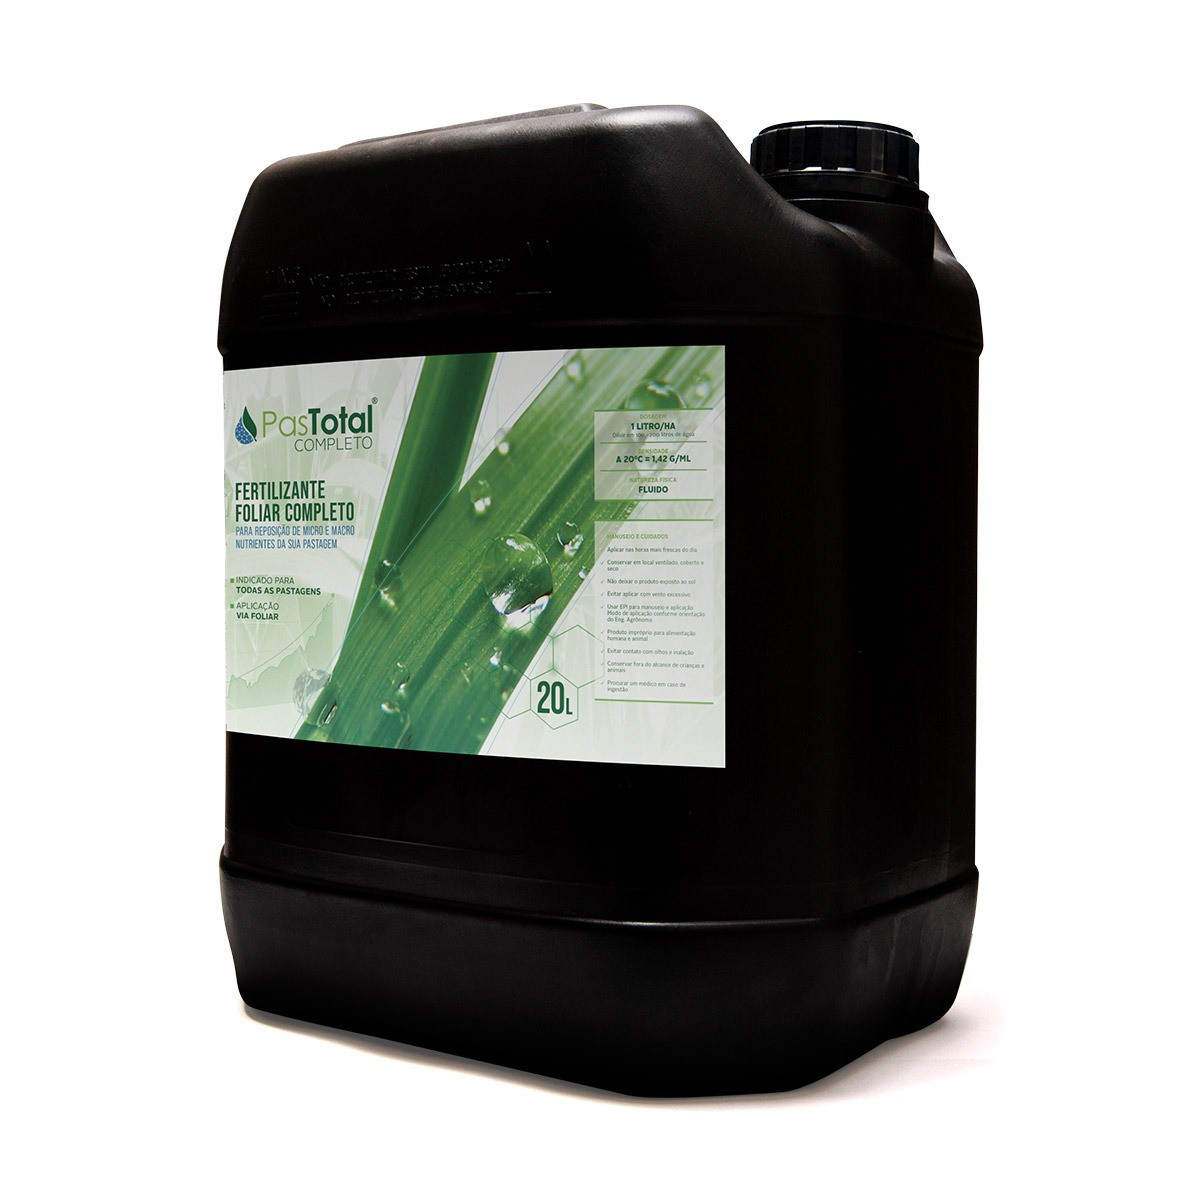 Fertilizante Foliar Para Pasto 20 Litros Pastotal Completo